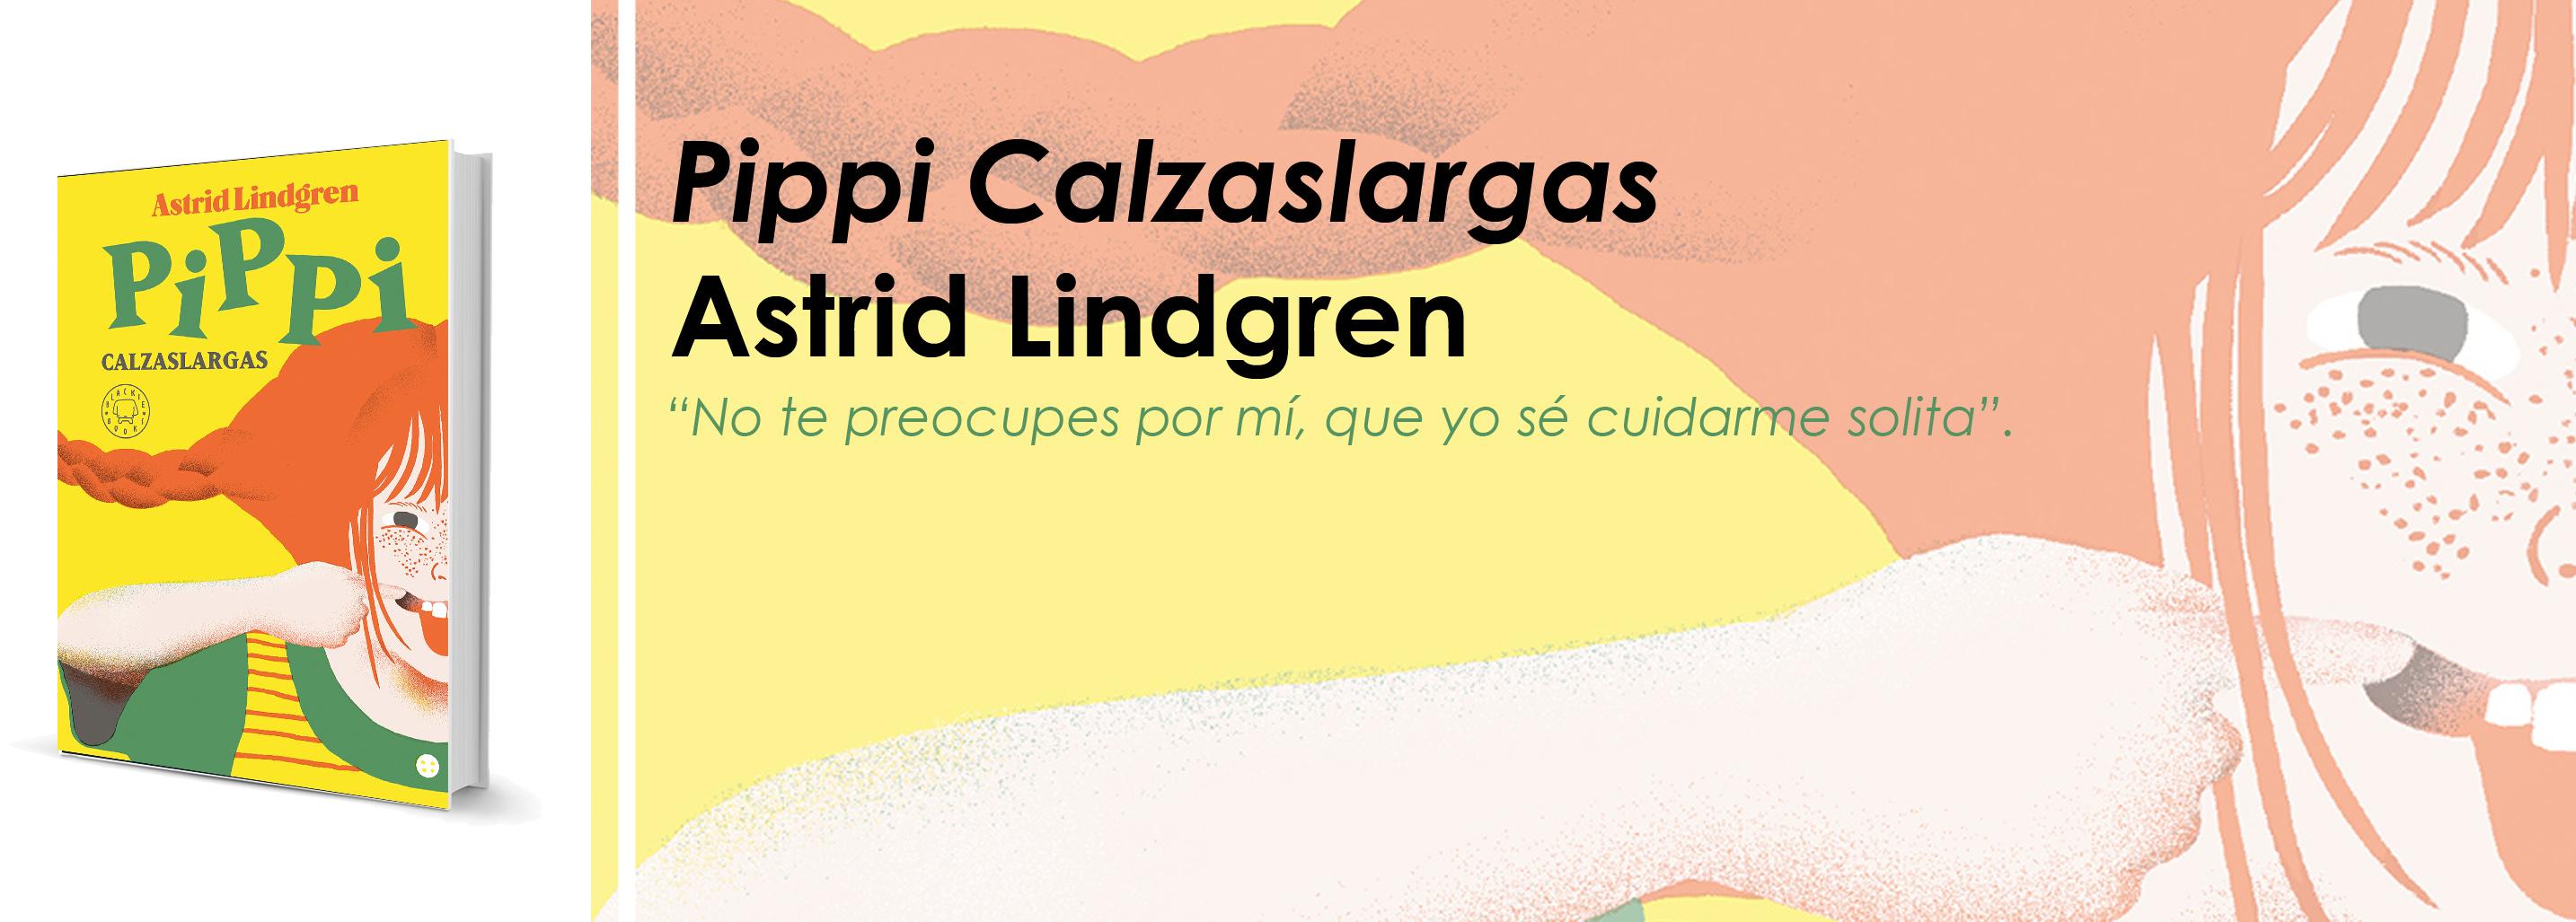 Pippi Calzaslargas, de Astrid Lindgren